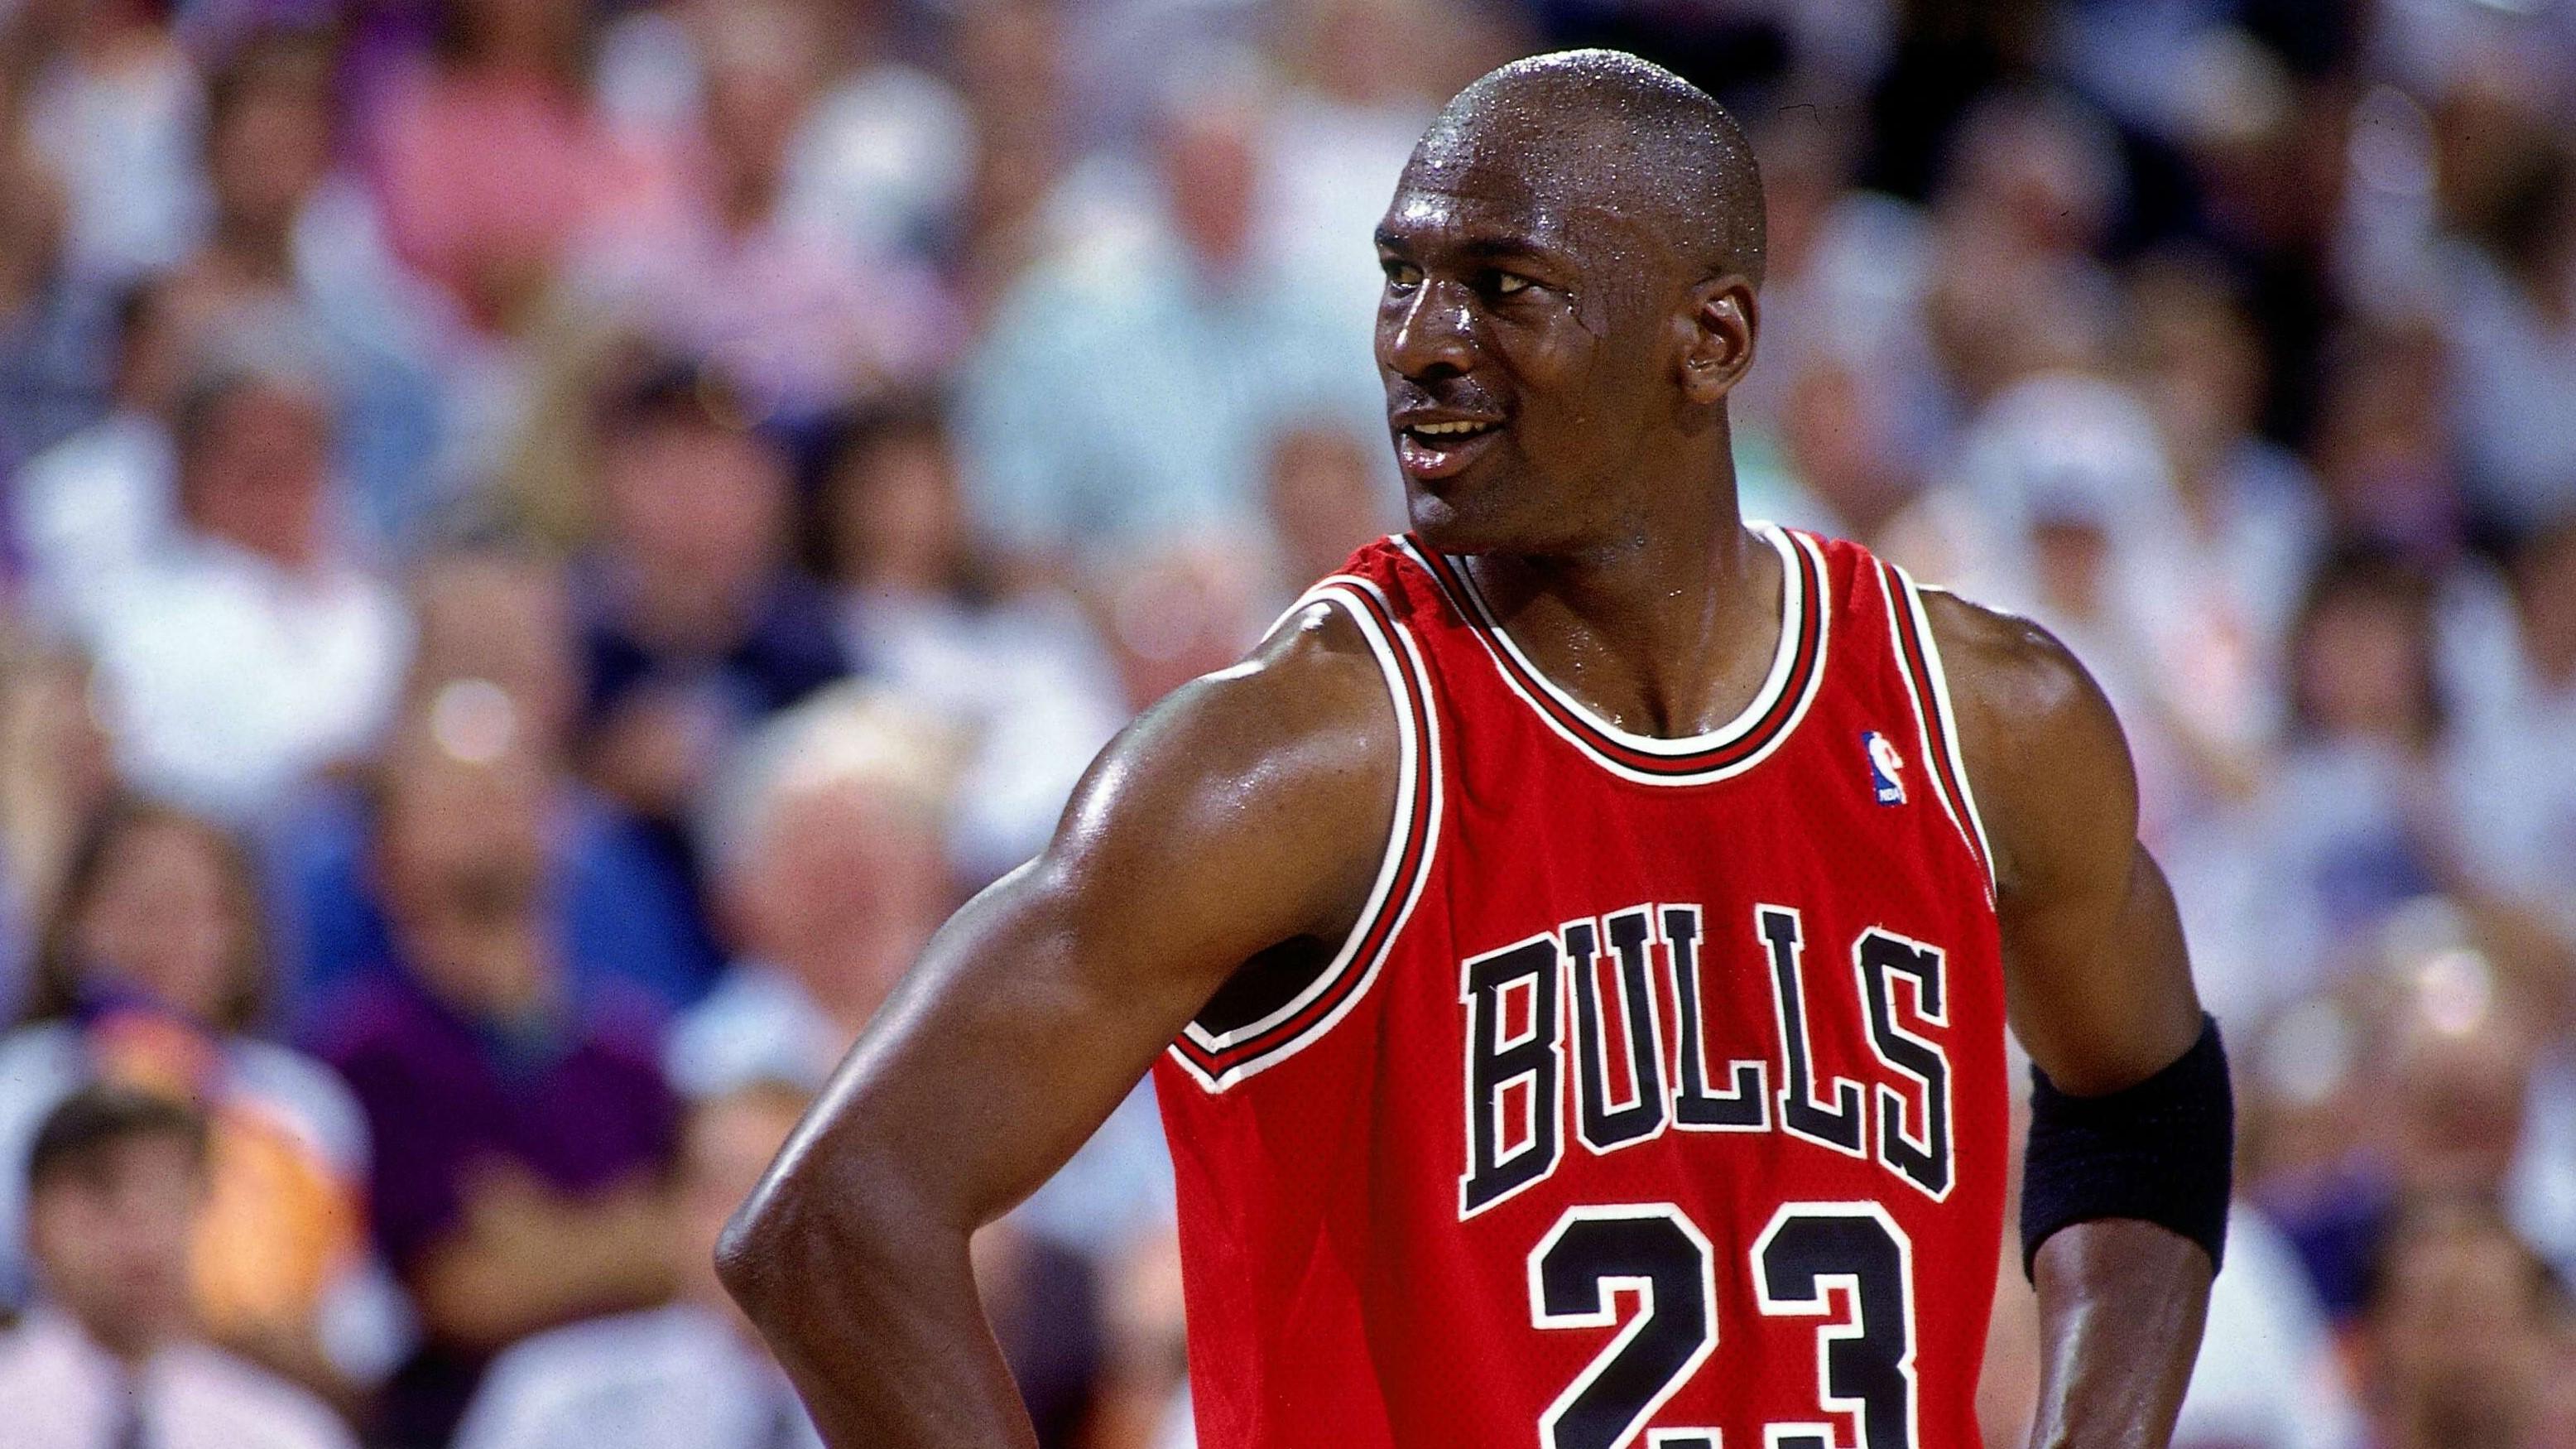 Michael Jordan's six NBA championships